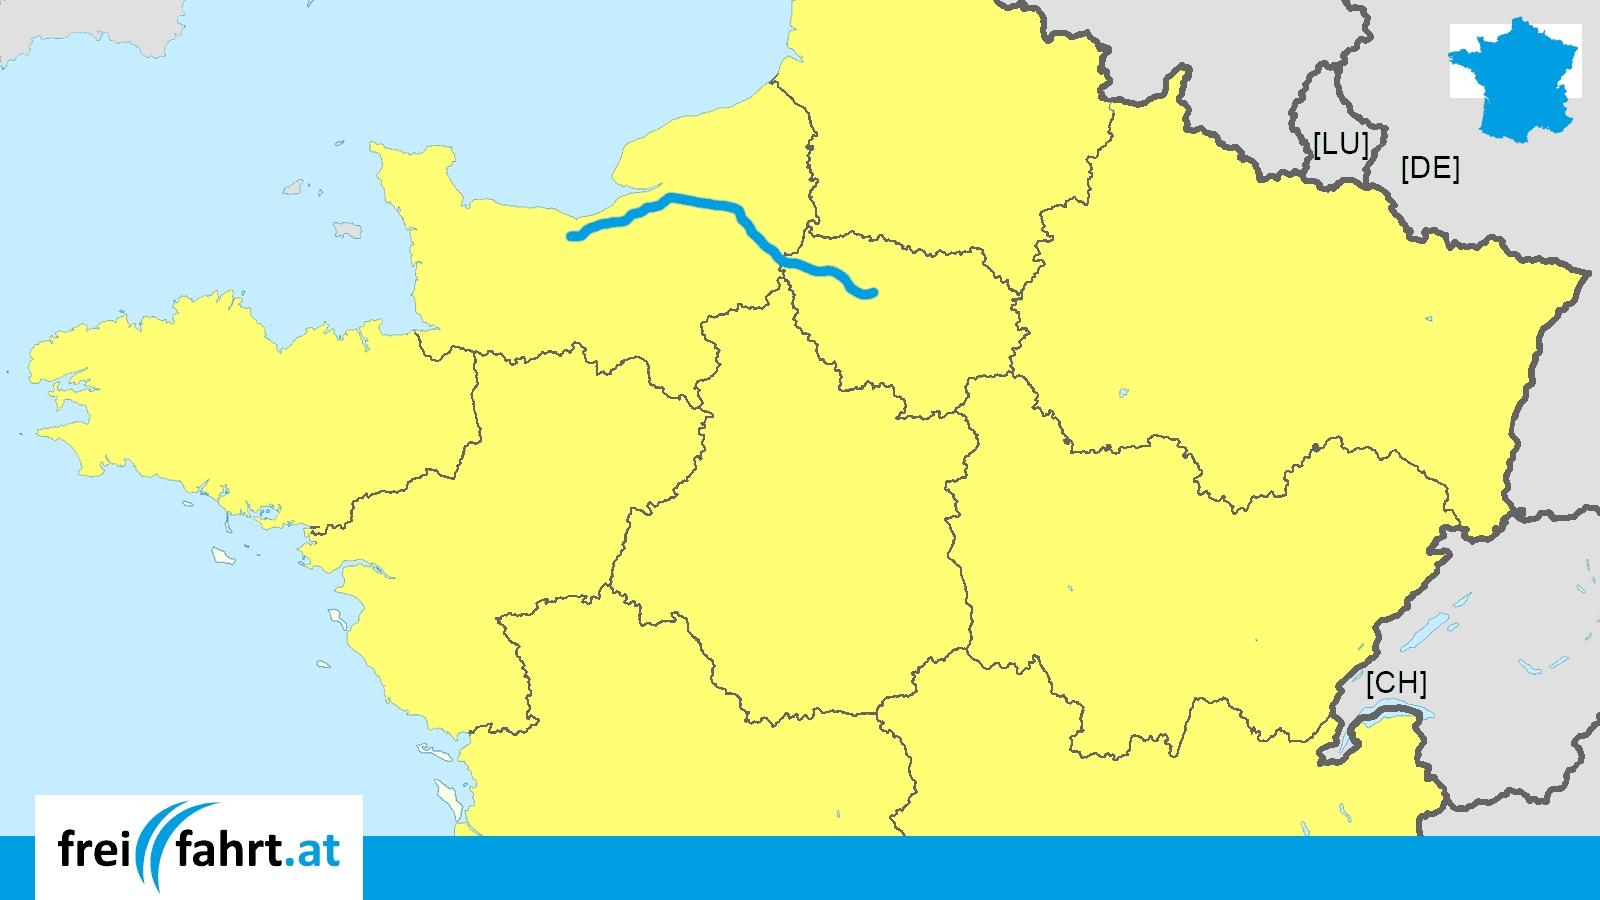 Service Areas A13 Motorway Normandie France Motorway Service Rest Area